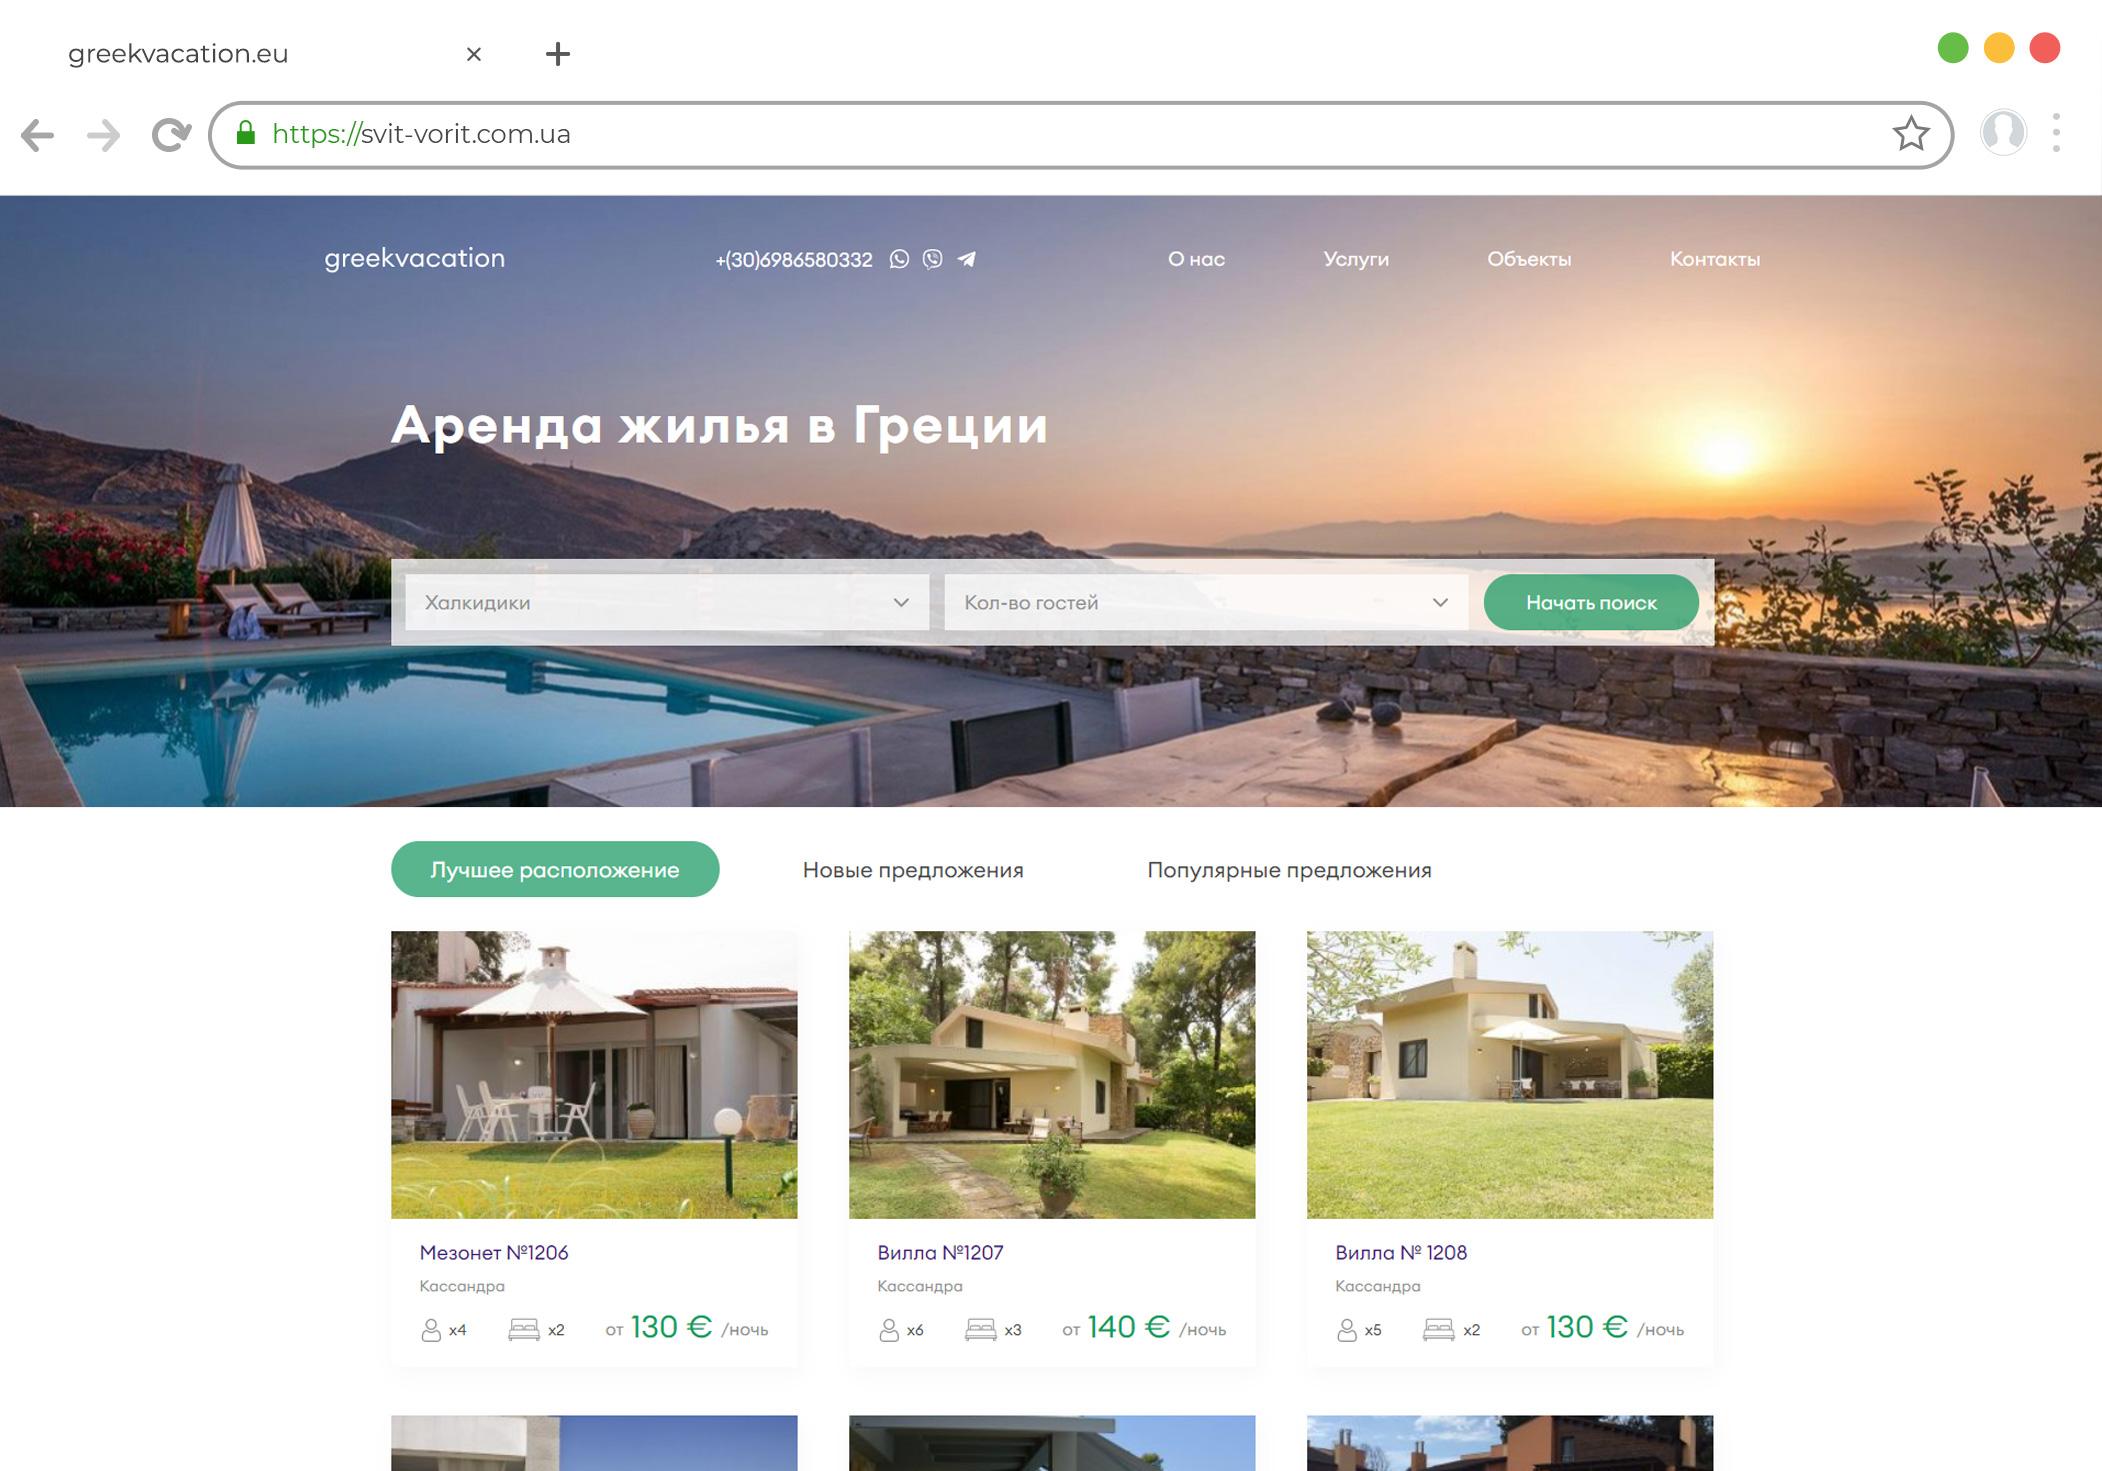 Разработка сайта онлайн-бронирования на Wordpress greekvacation